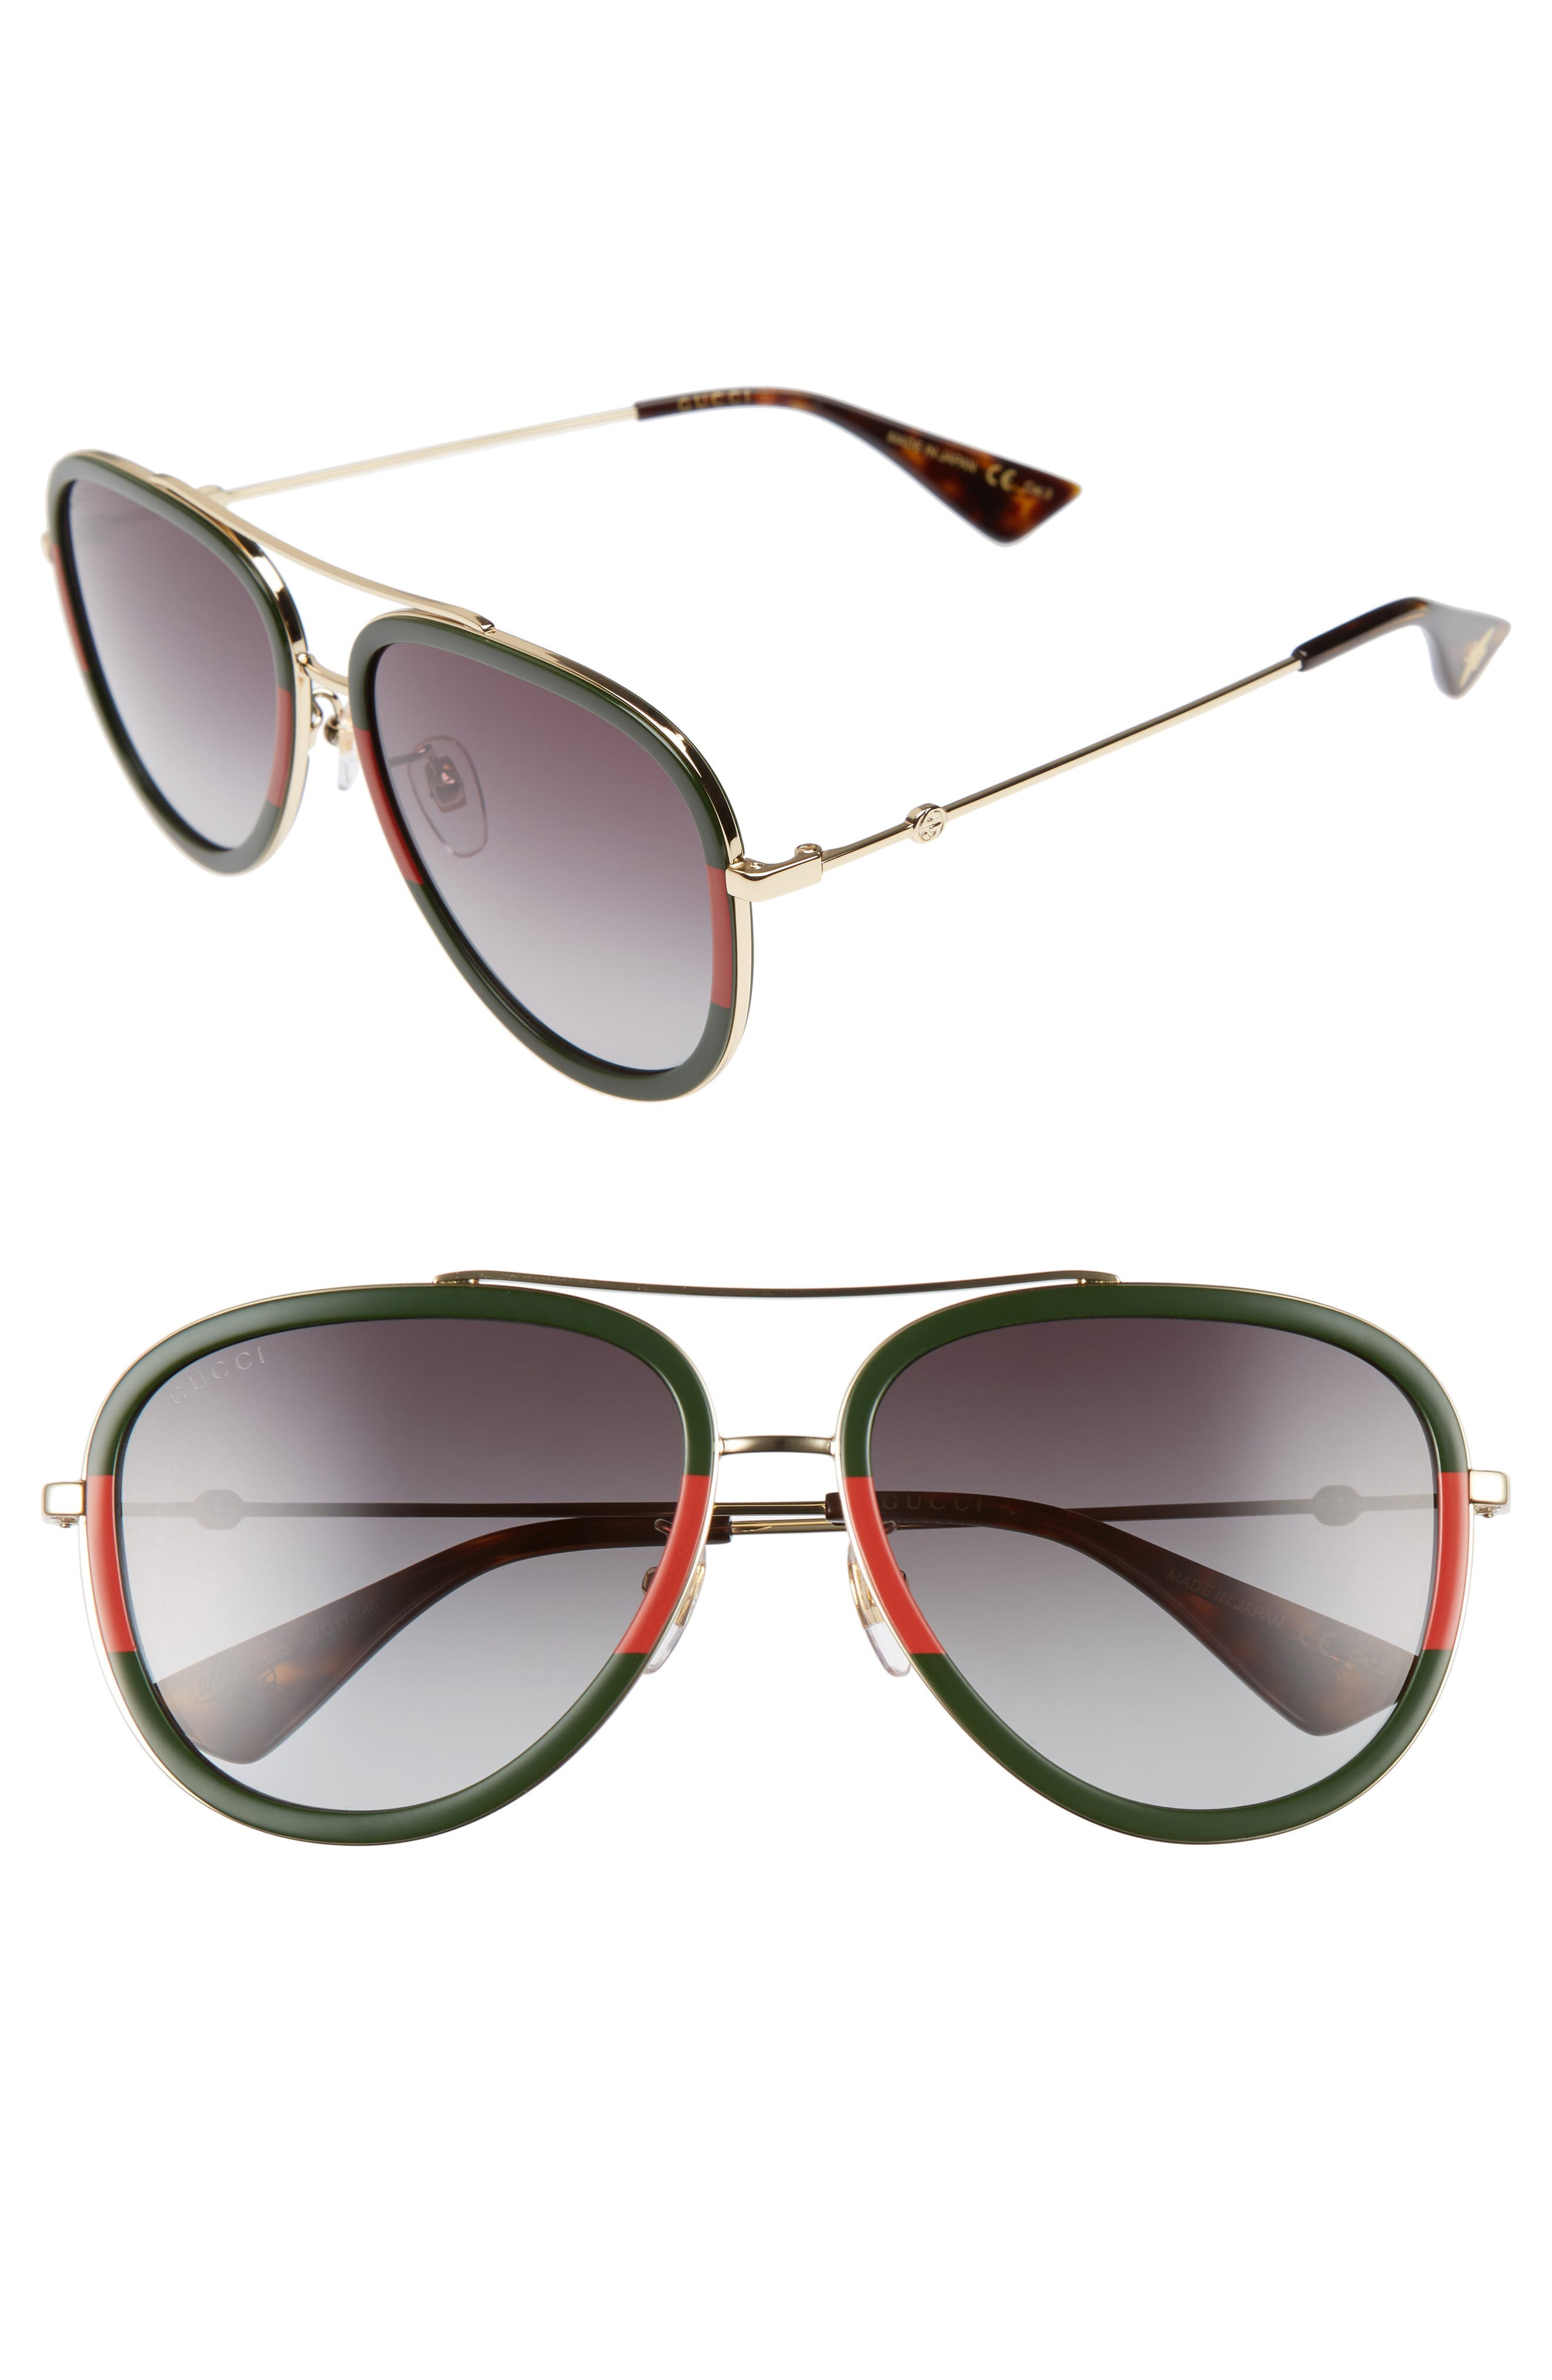 57mm Aivator Sunglasses,                             Main thumbnail 1, color,                             MEDIUM GOLD